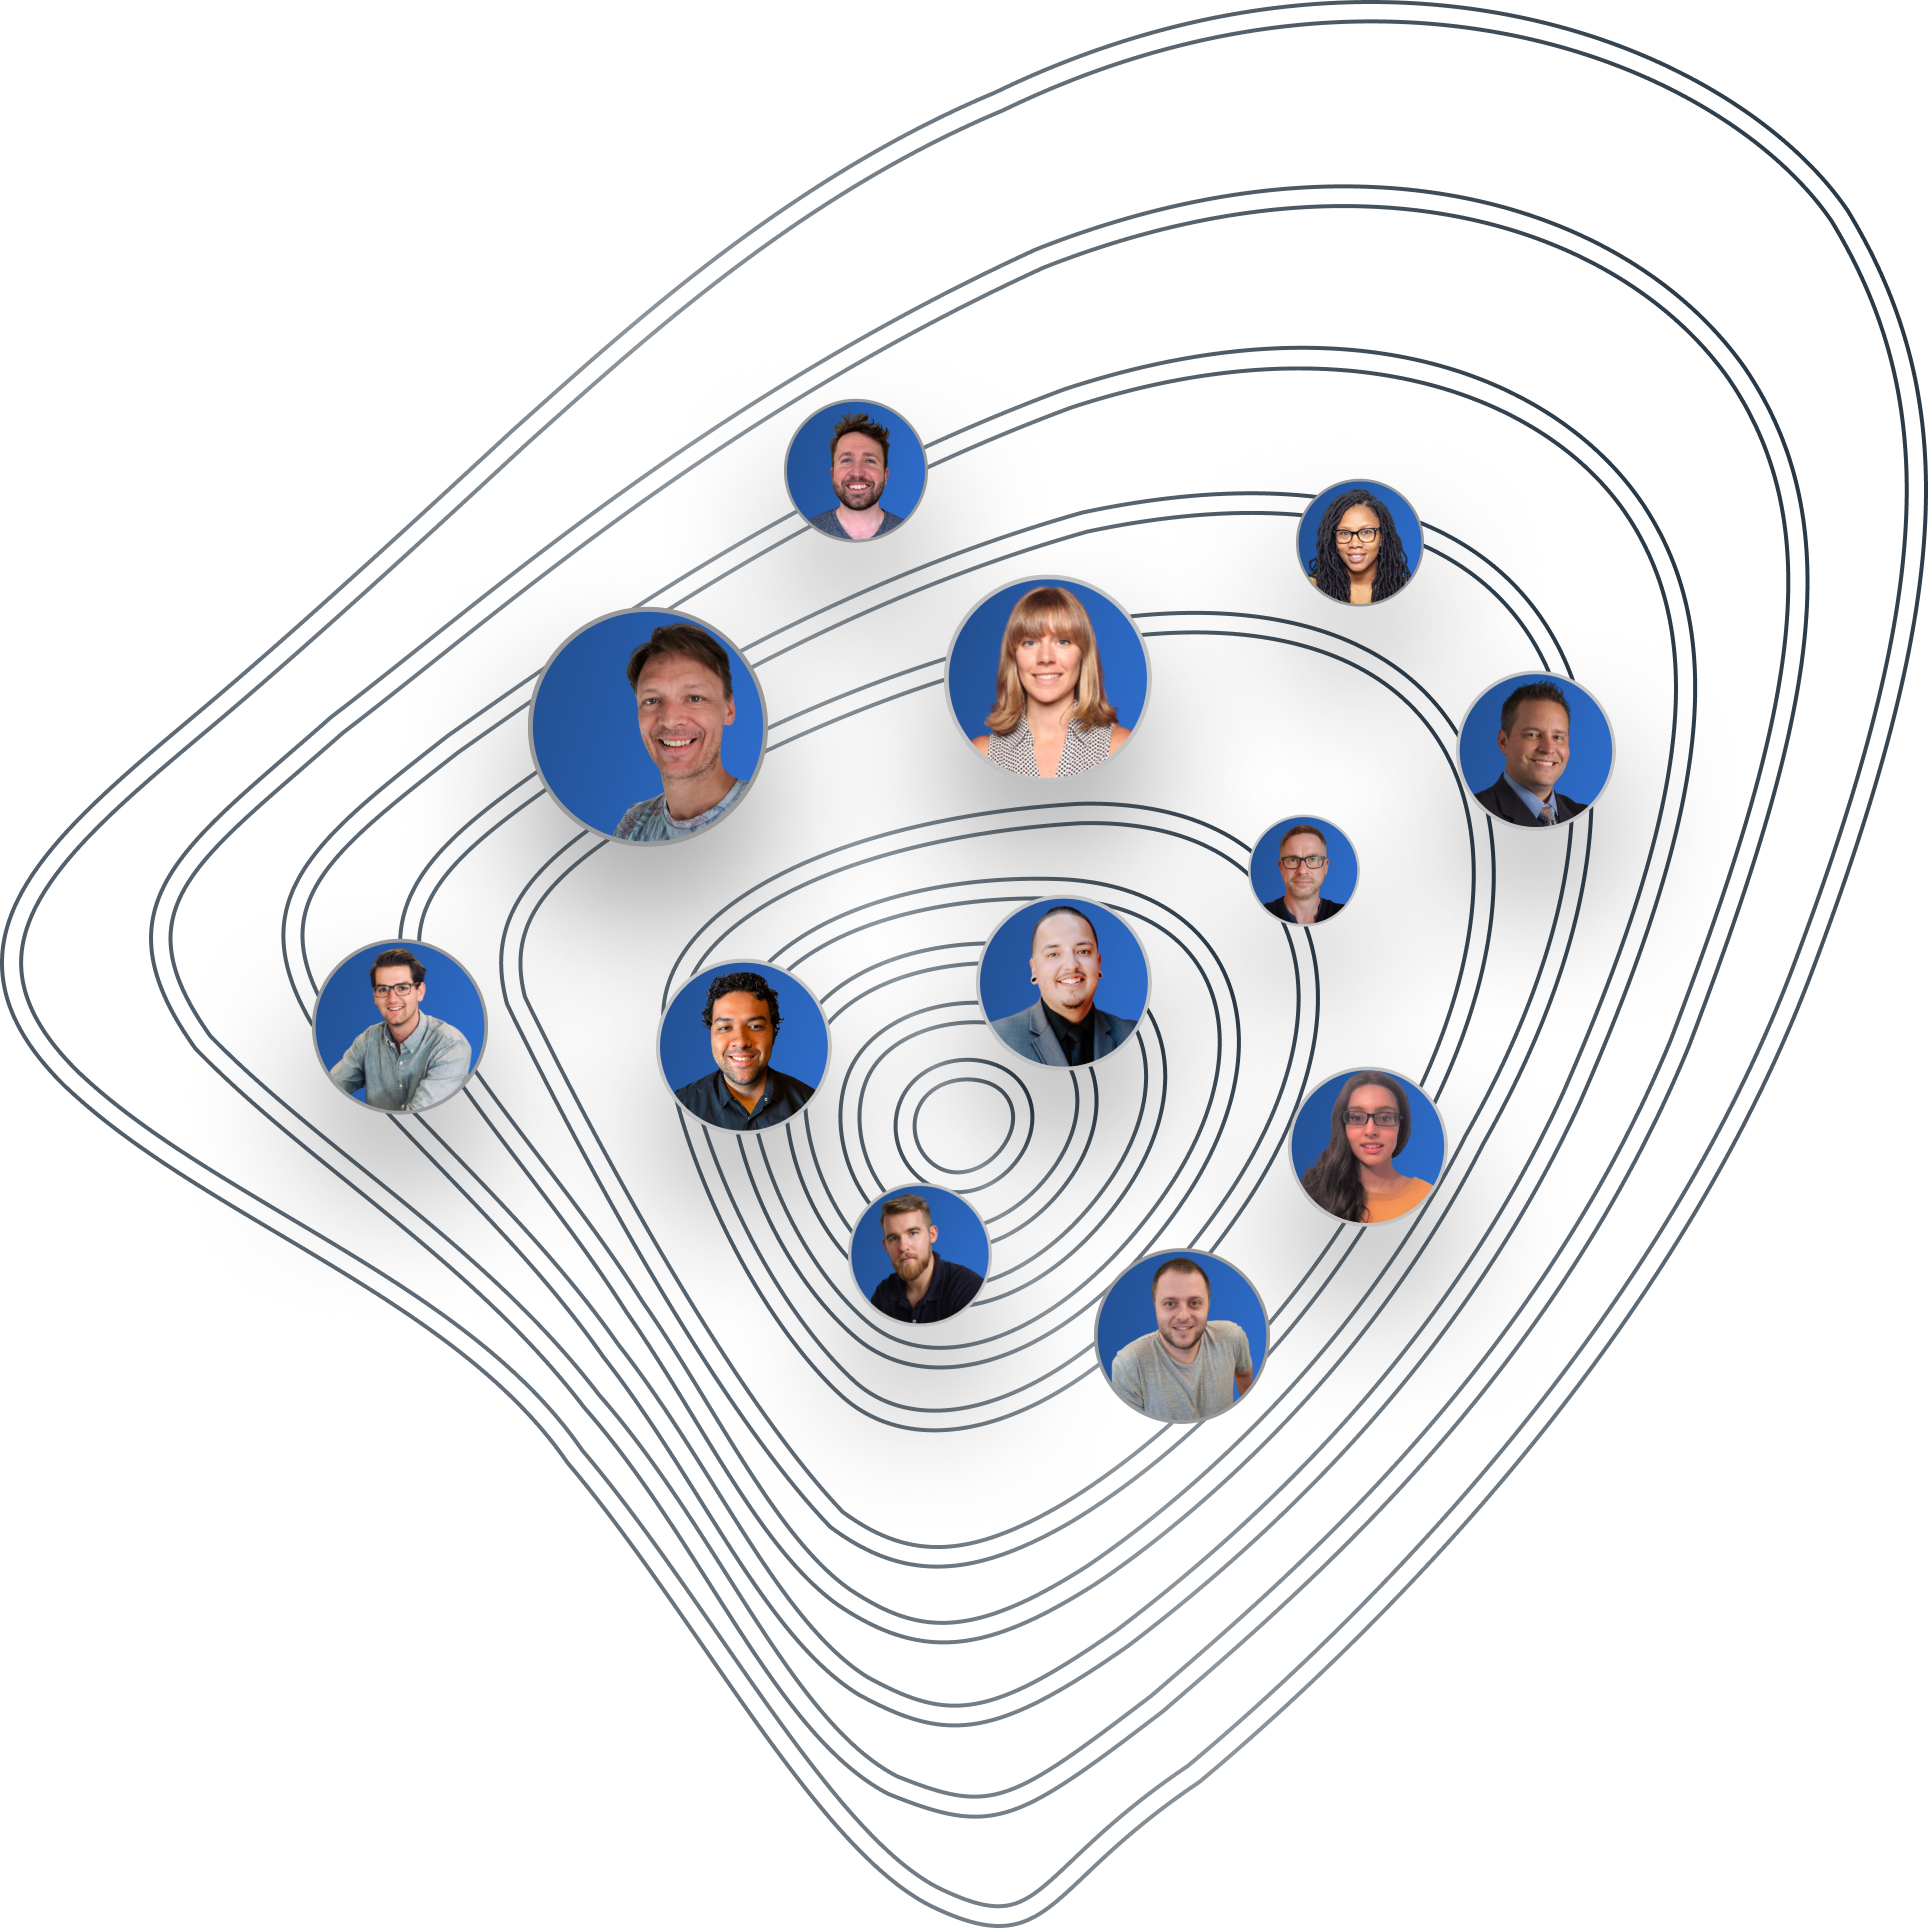 DNSFilter team